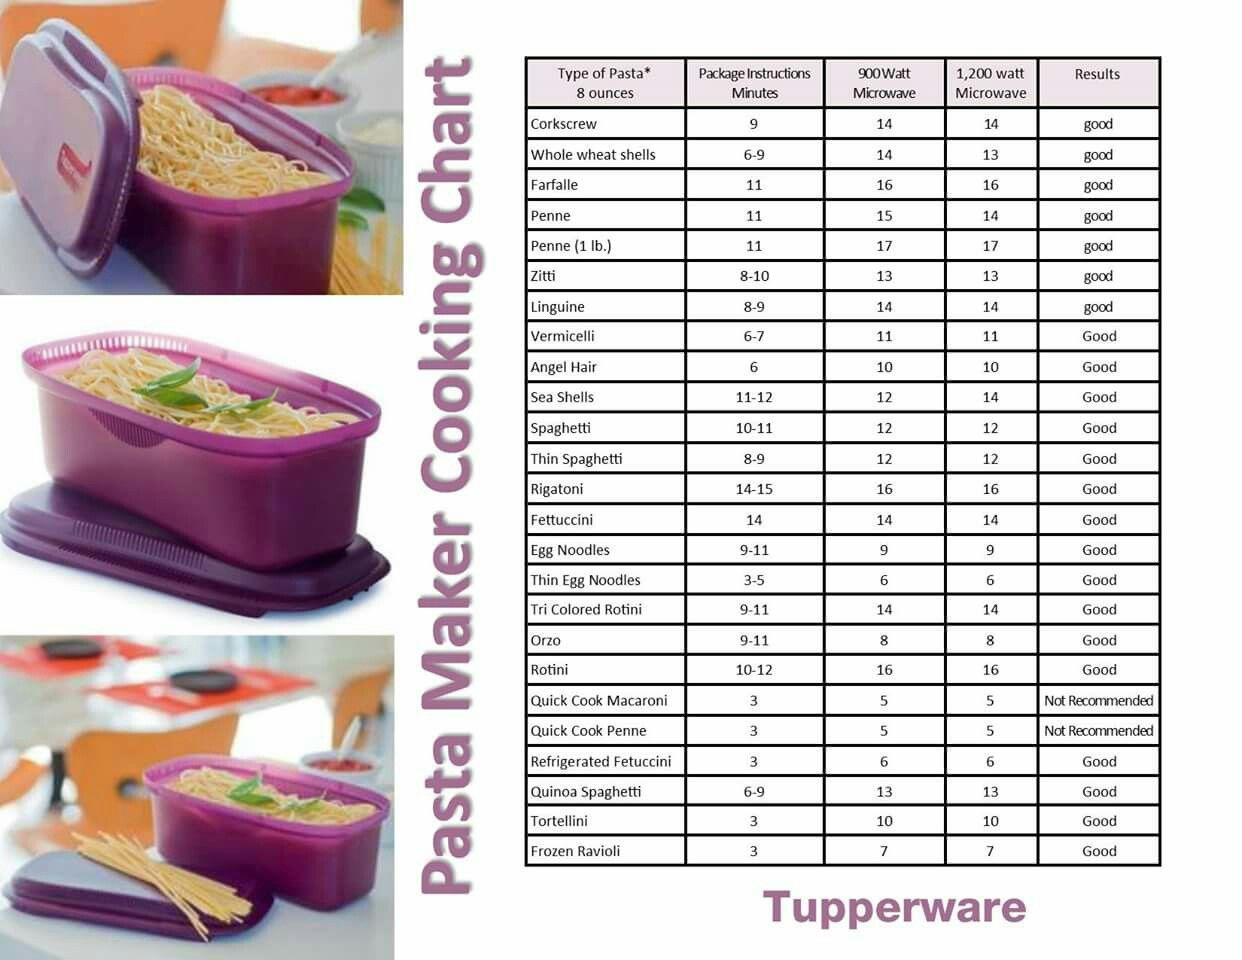 Pingl par claudia roberge sur tupperware tupperware - Atelier cuisine tupperware ...